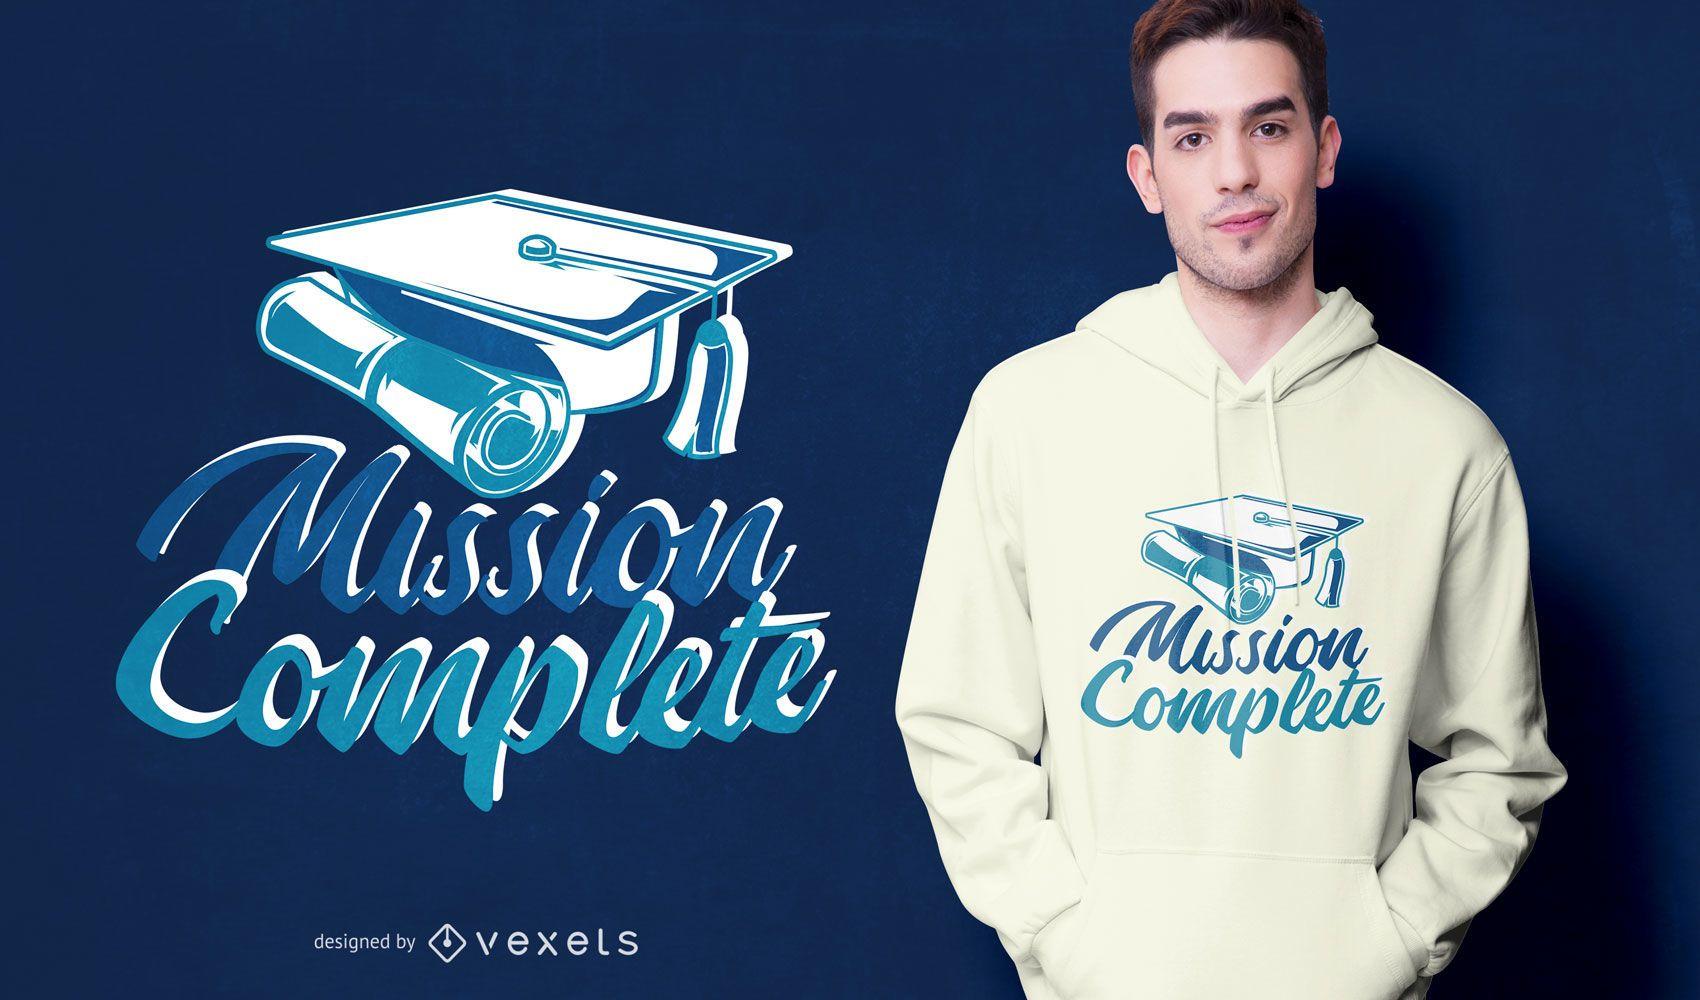 Graduation Funny Quote T-shirt Design